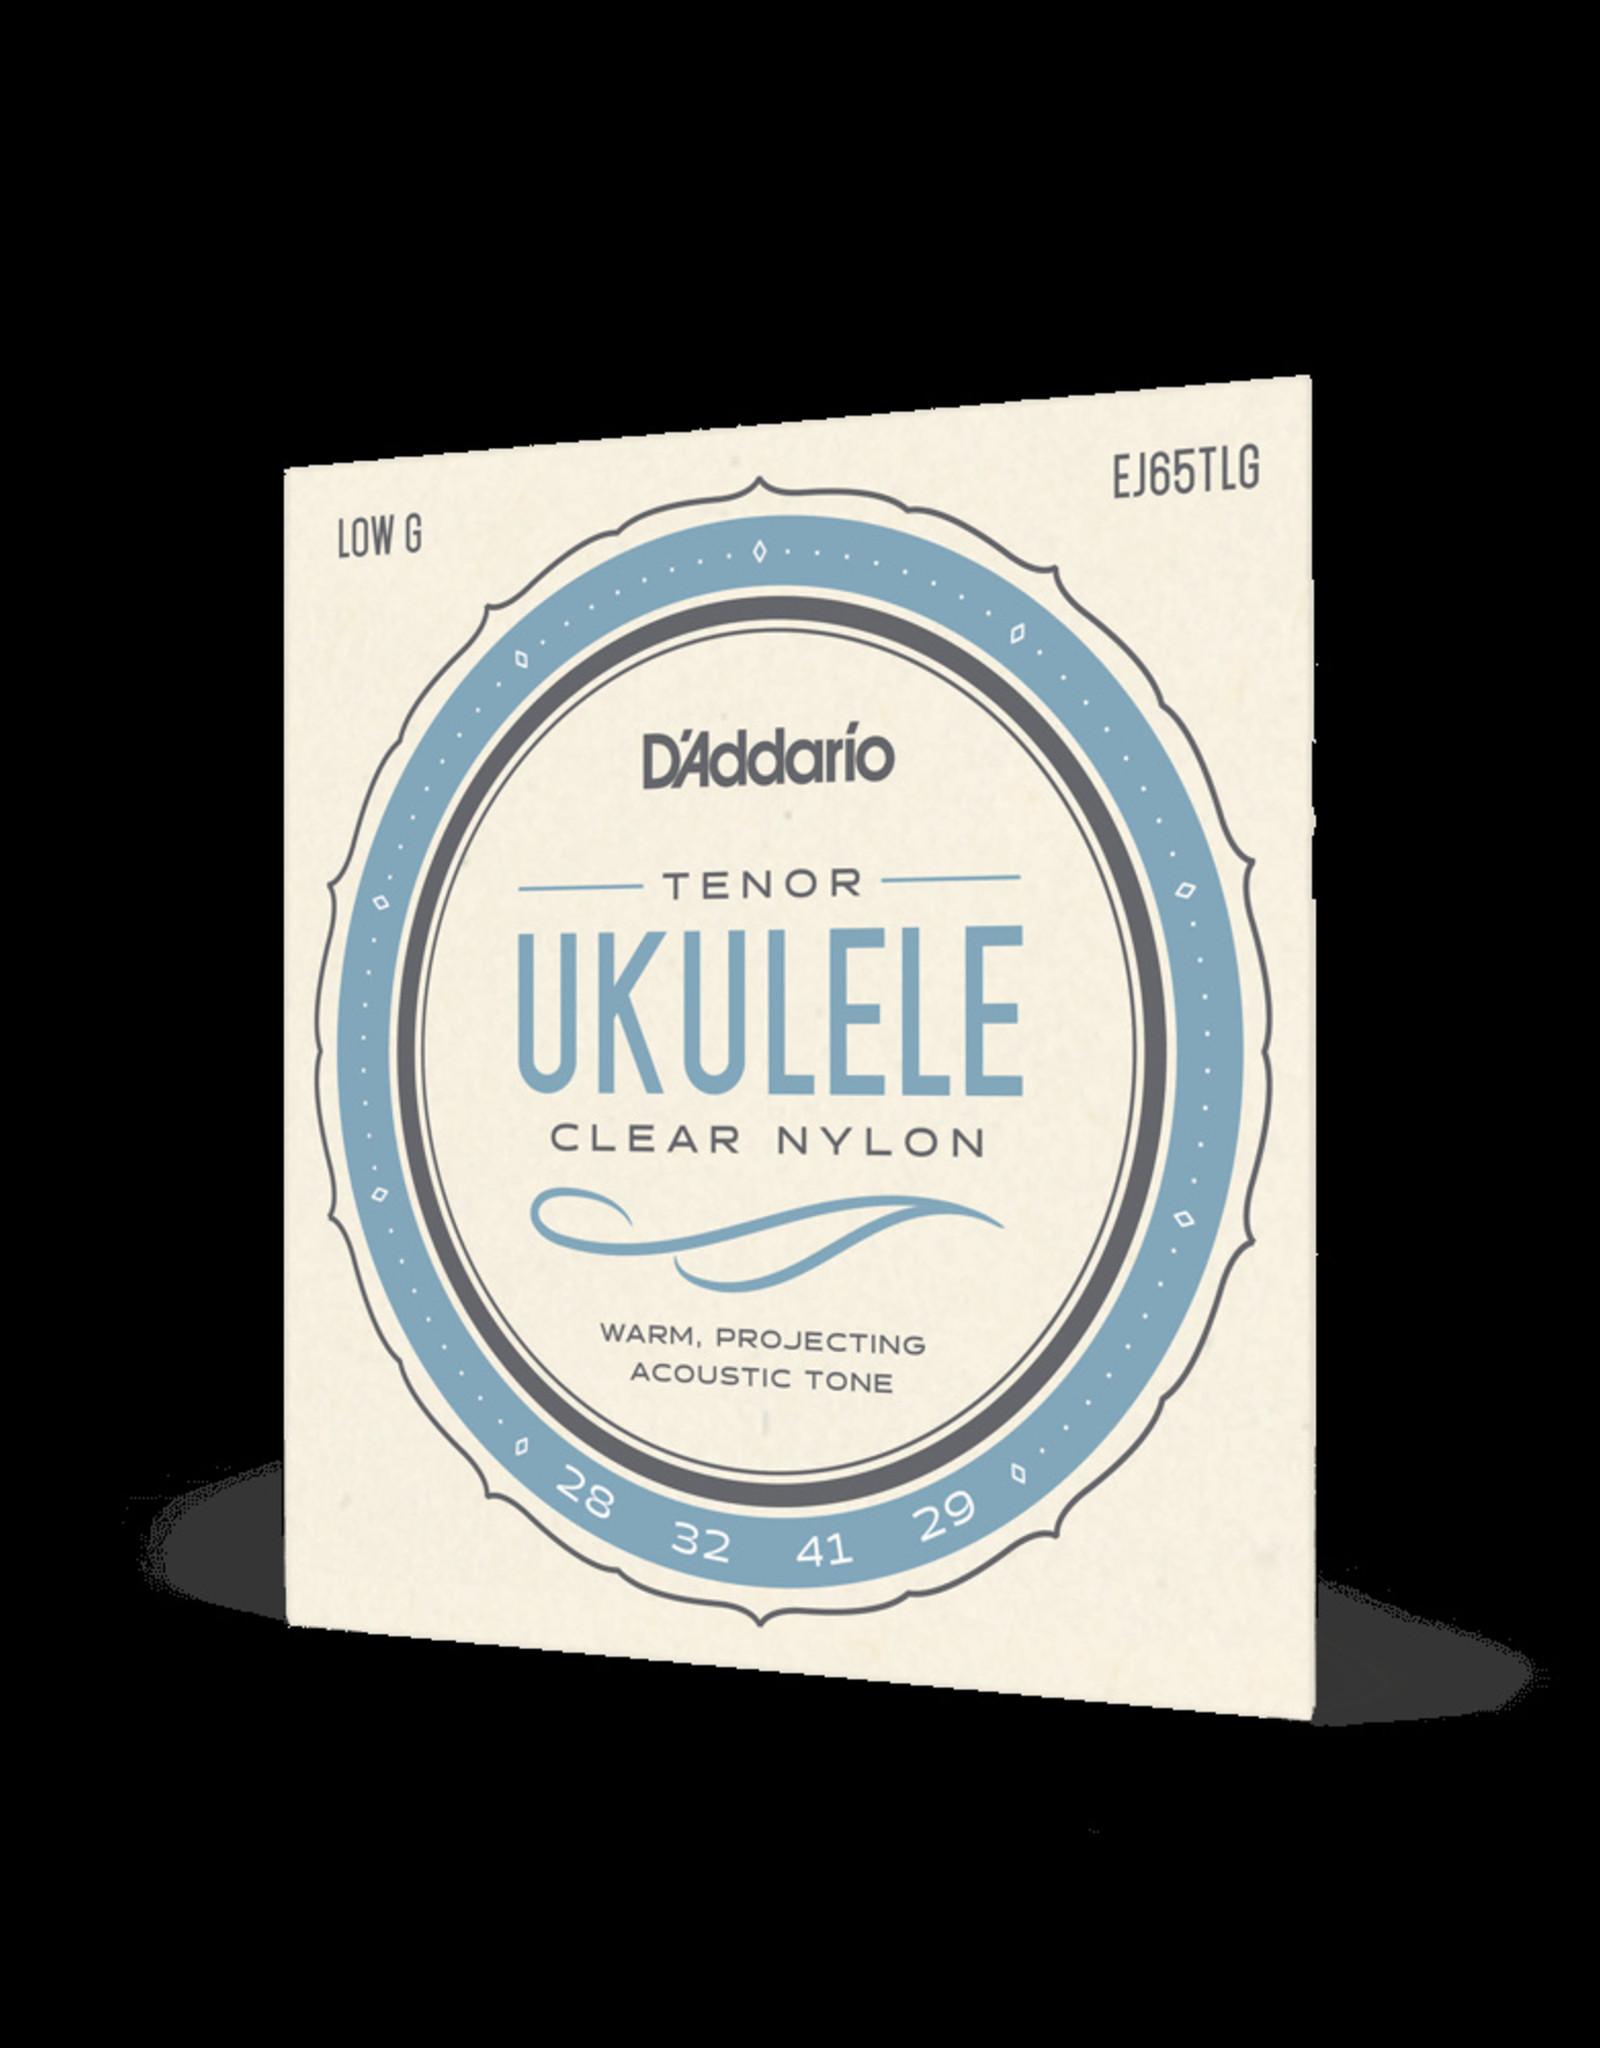 D'Addario D'Addario Pro-Arté Custom Extruded Ukulele Strings, Tenor Low G